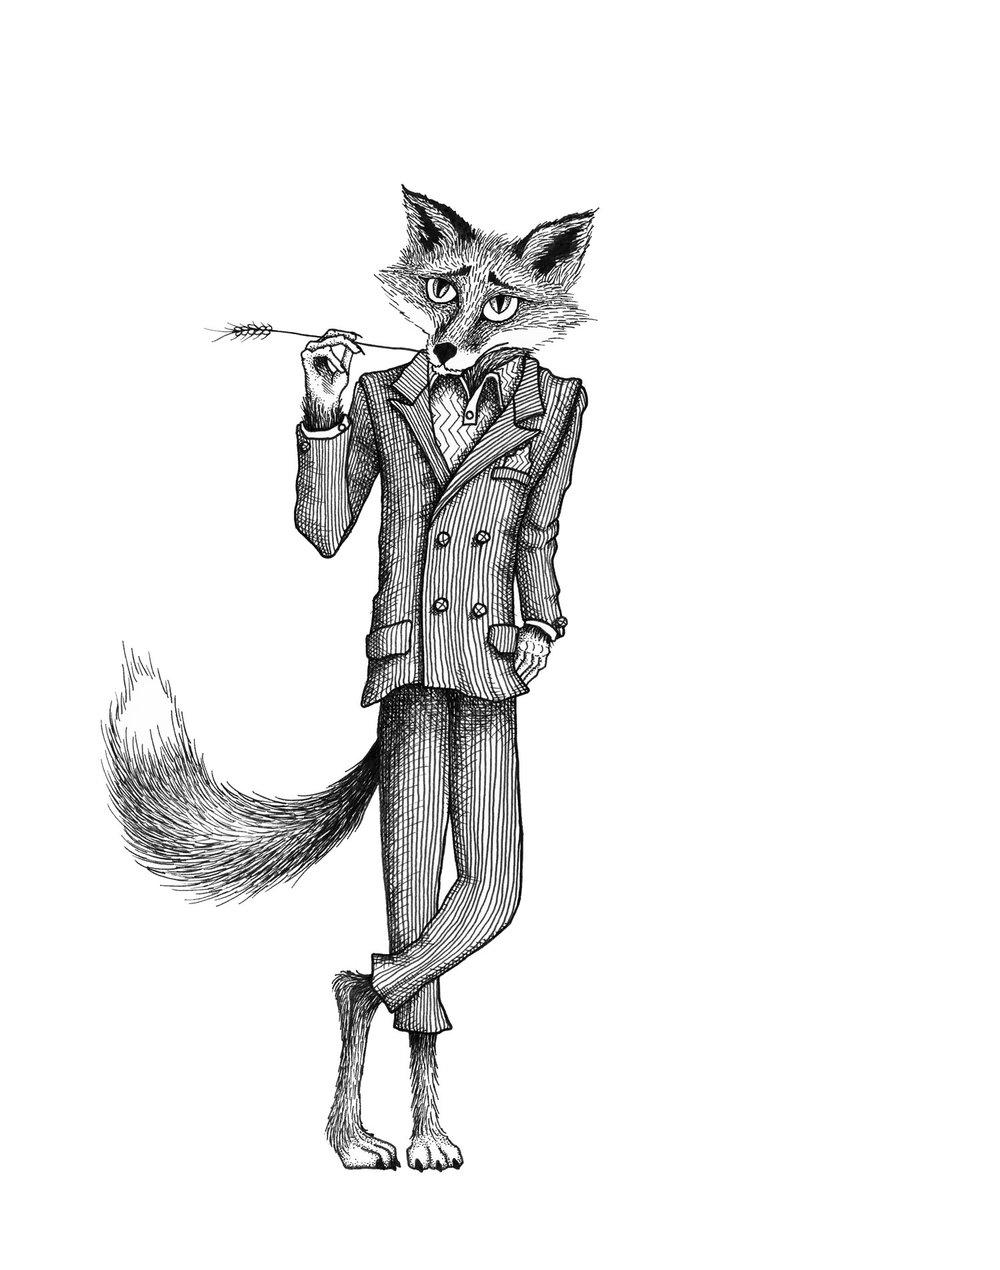 fantastic-mr-fox-roald-dahl-illustration-matthew-woods.jpg